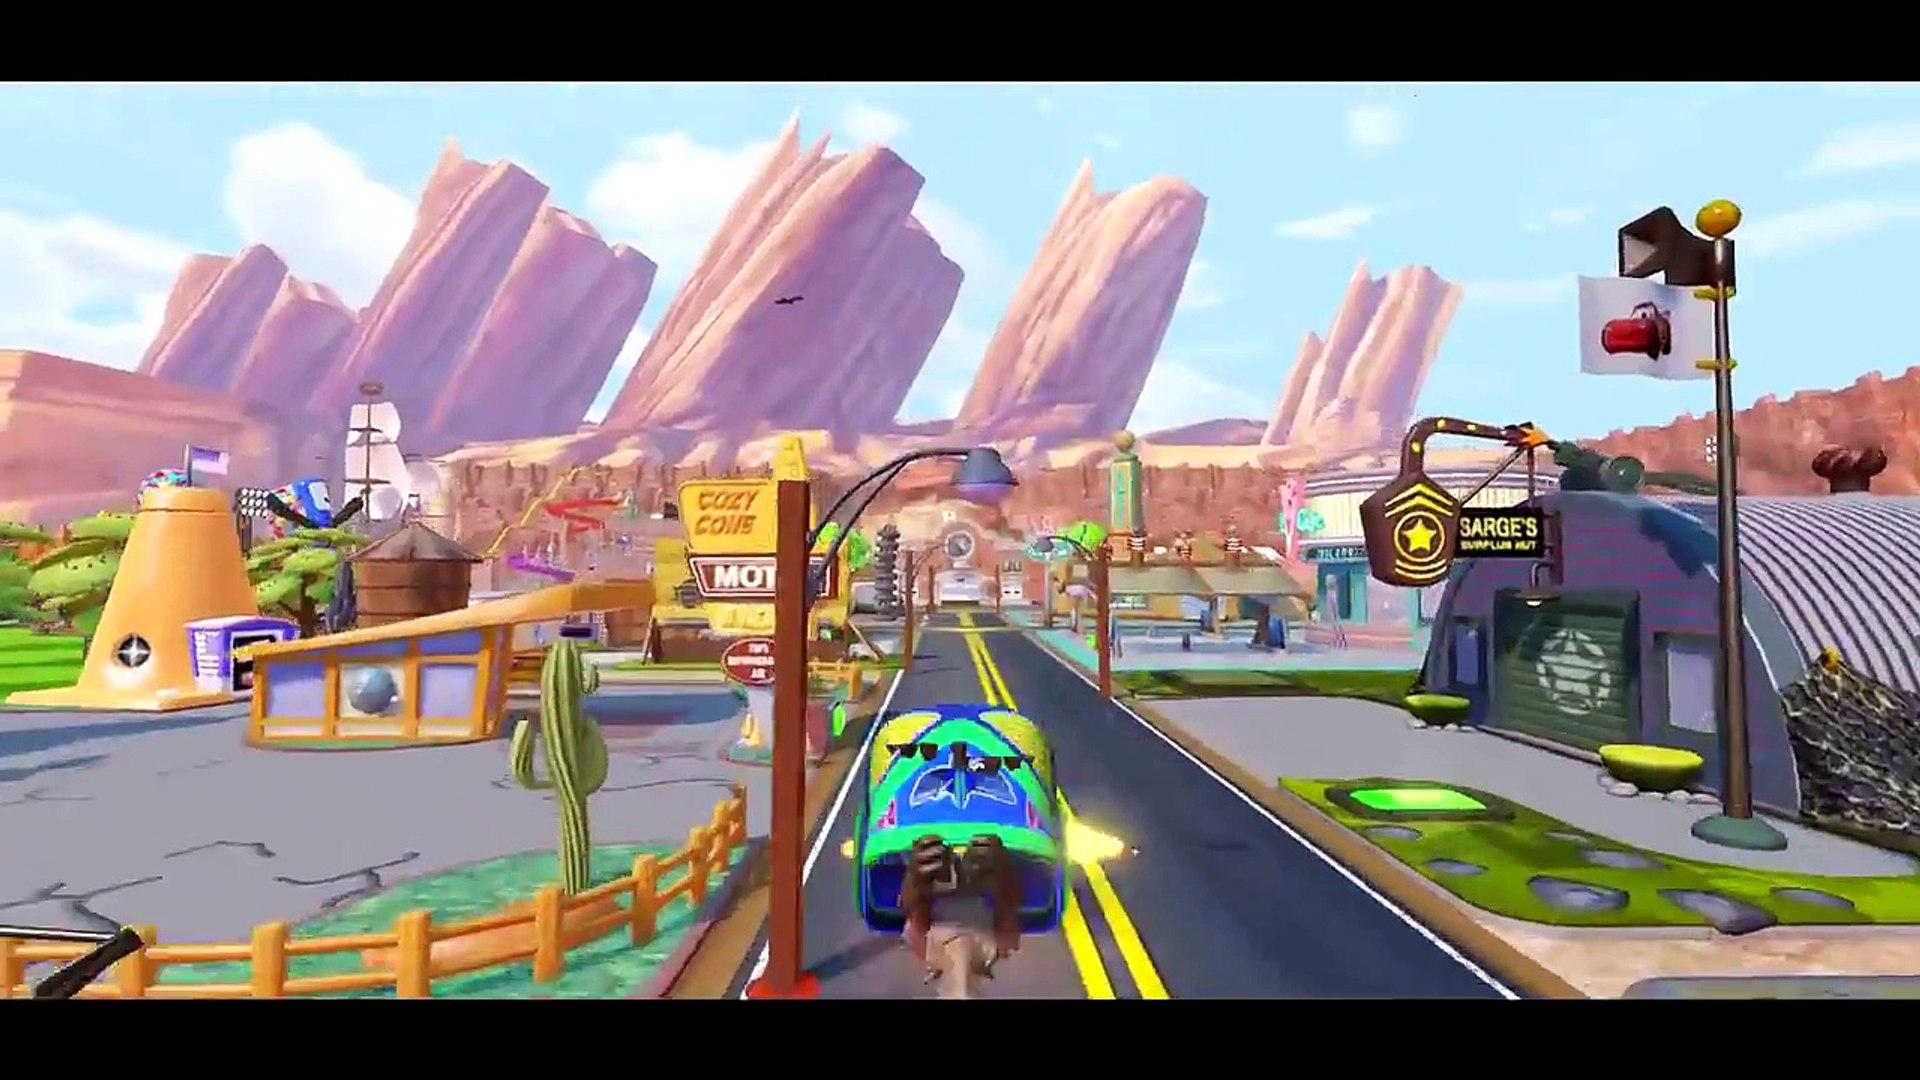 Spiderman & Groot meet Disney Pixar Cars Lightning McQueen and have fun !